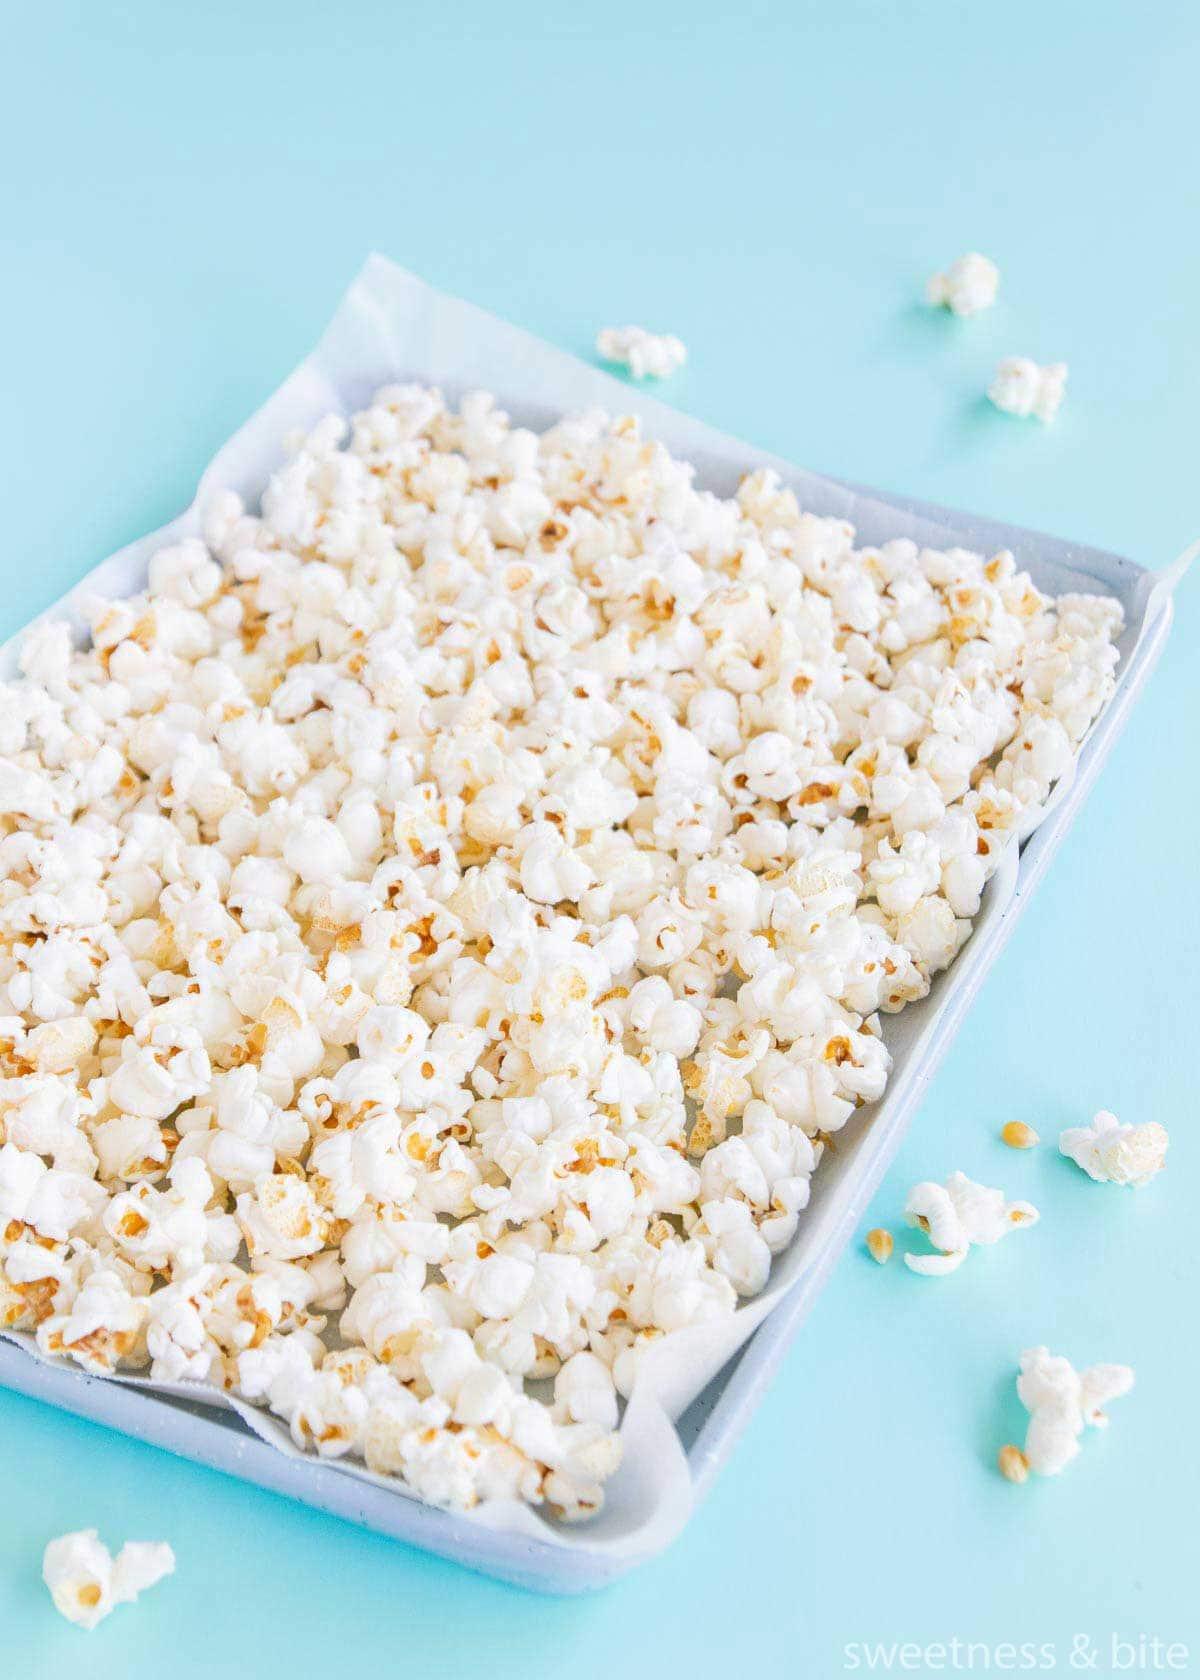 A tray of plain, popped popcorn on a blue background.